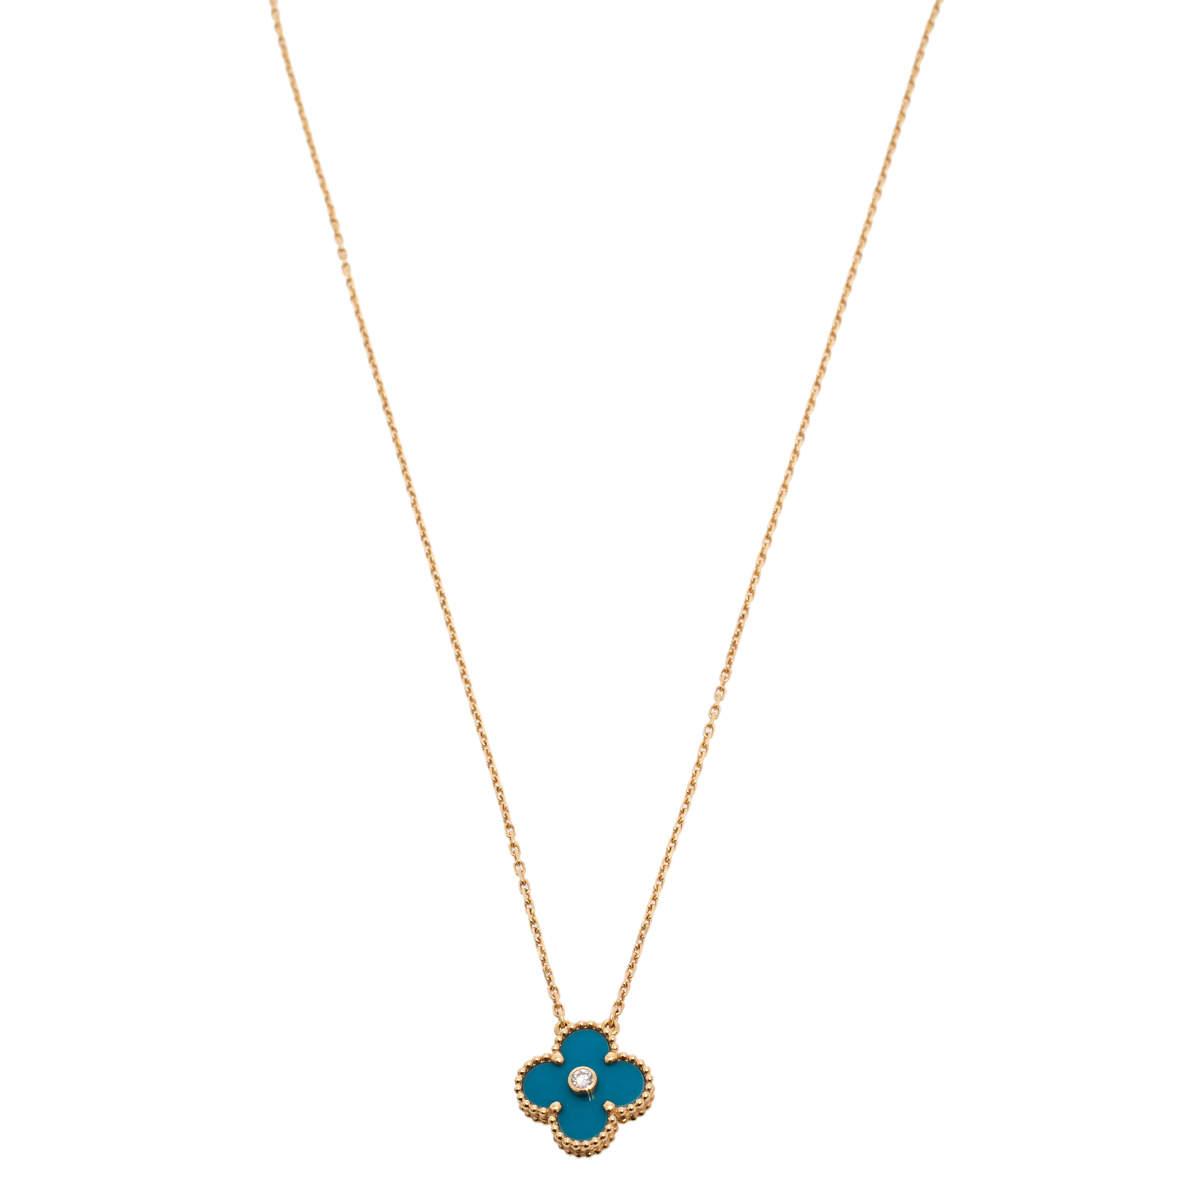 Van Cleef & Arpels Vintage Alhambra Blue Inlay Diamond 18K Yellow Gold Pendant Necklace